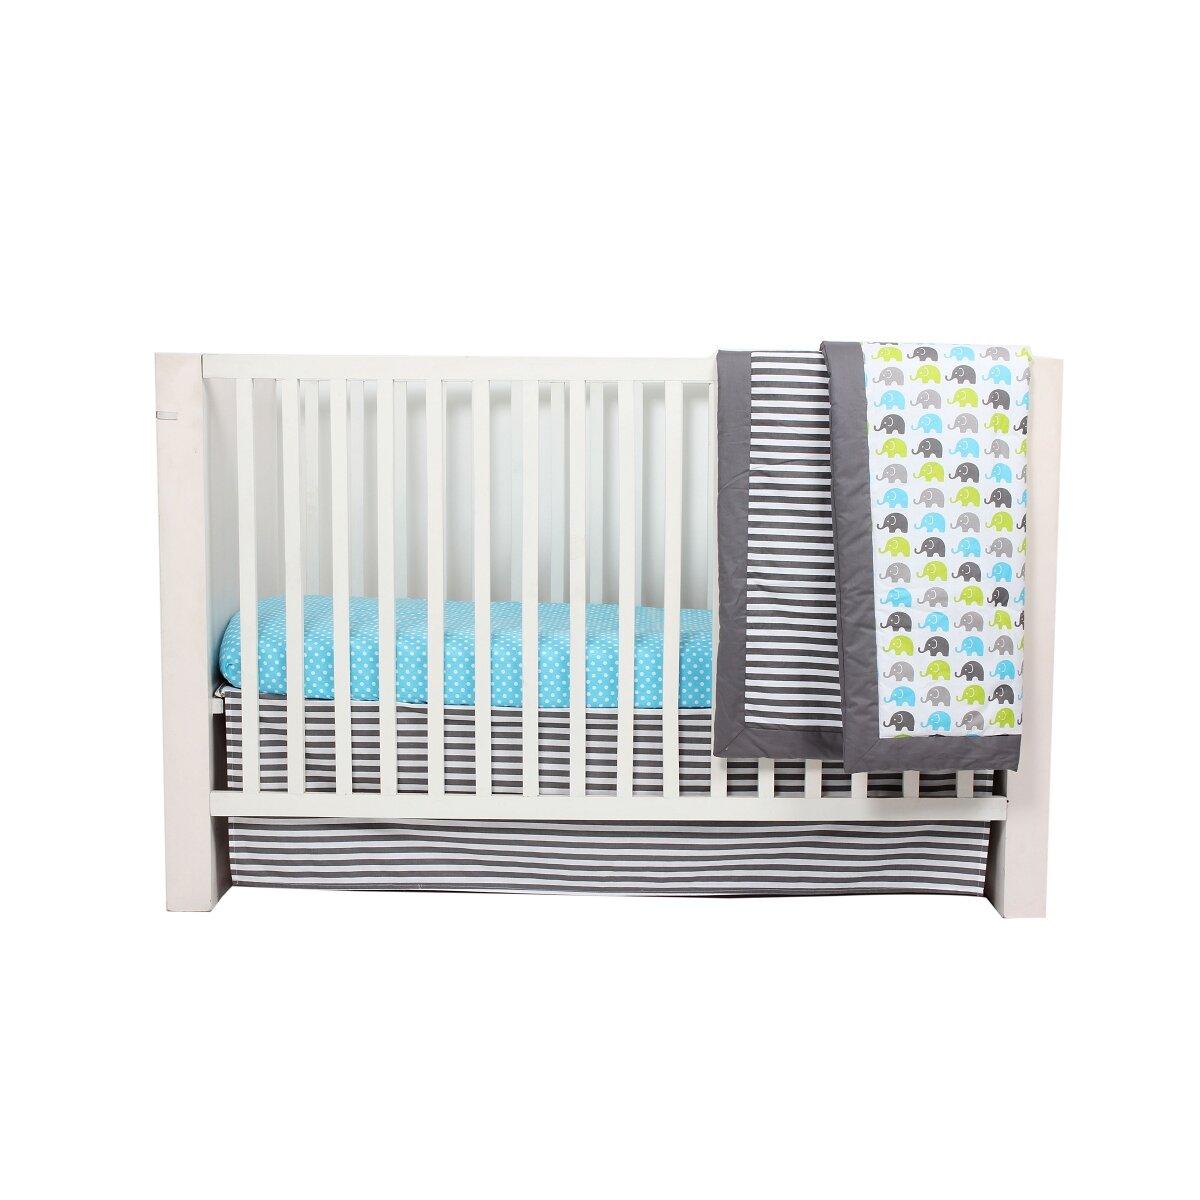 Crib for sale orlando fl - Viv Rae Trade Yasmeen 10 Piece Crib Bedding Set